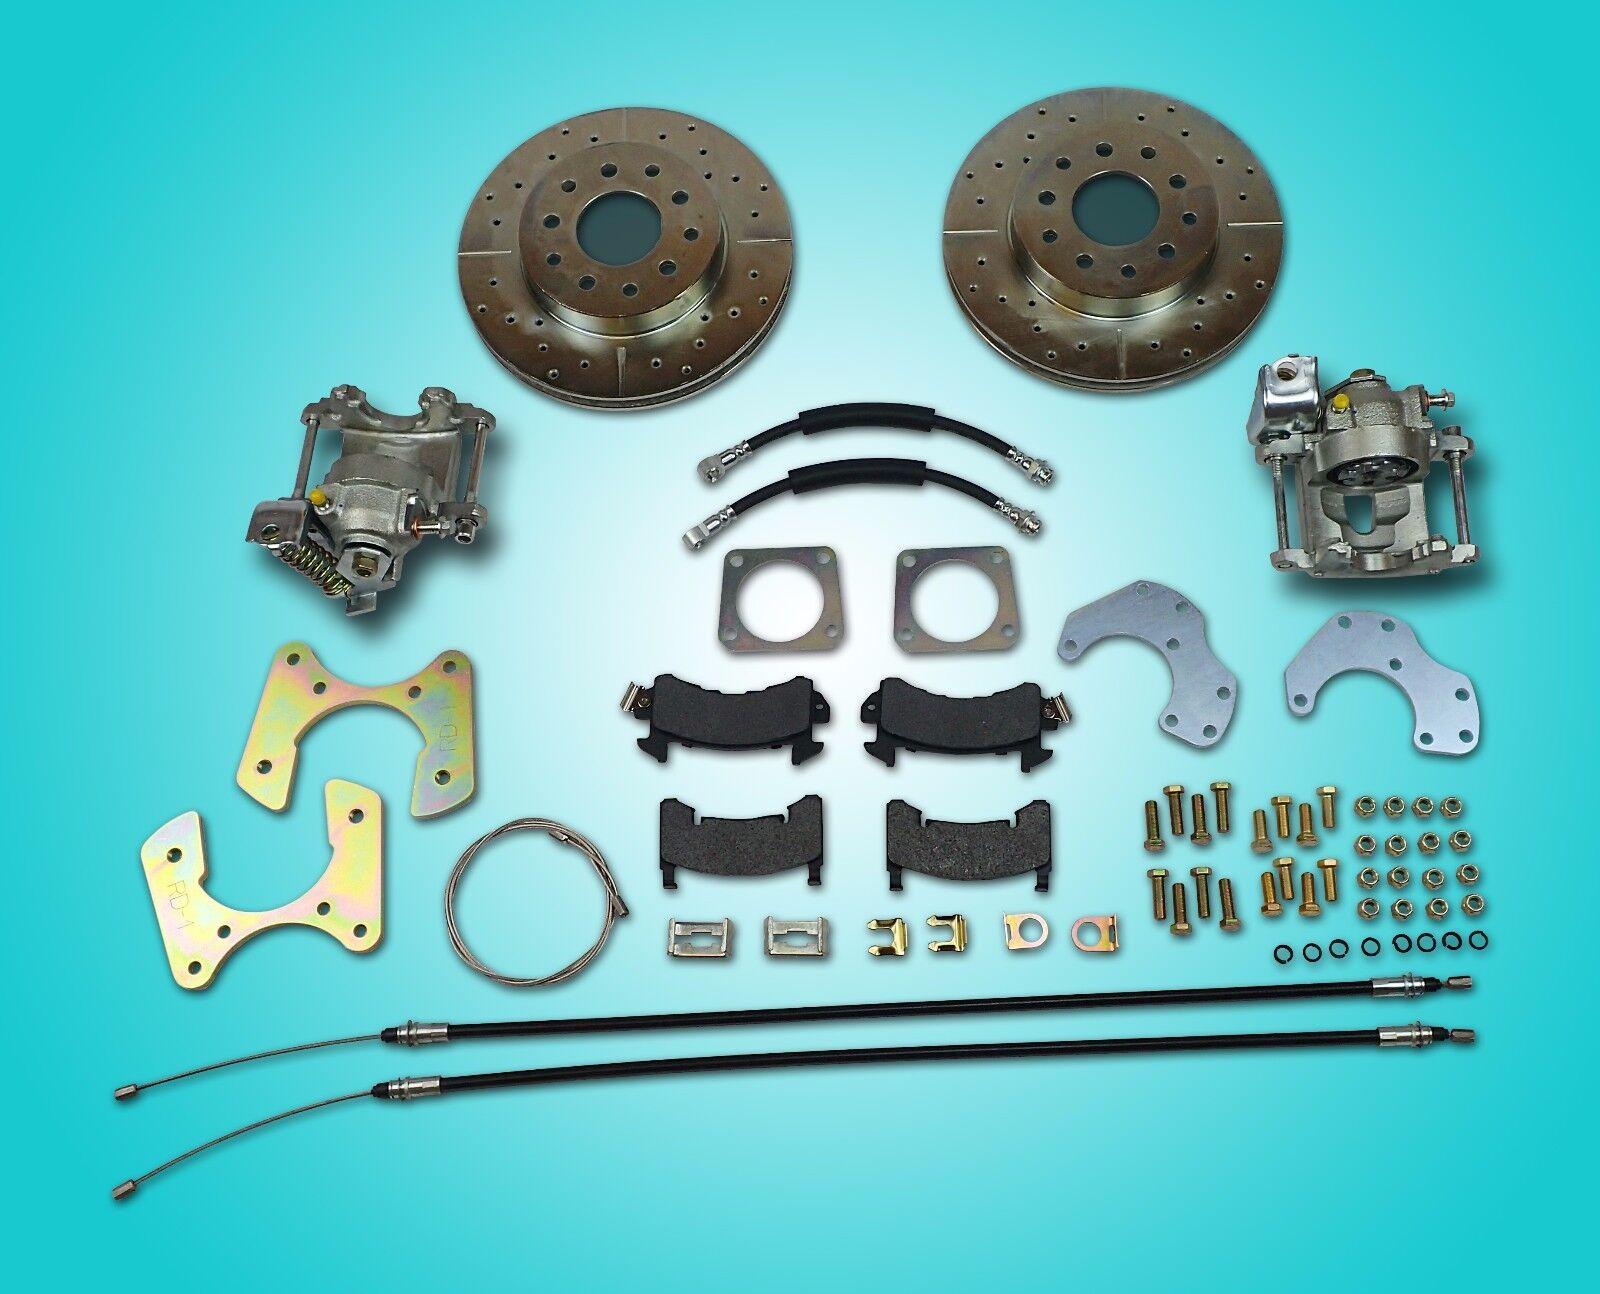 1967 1968 1969 camaro rear disc brake conversion for non staggered shocks